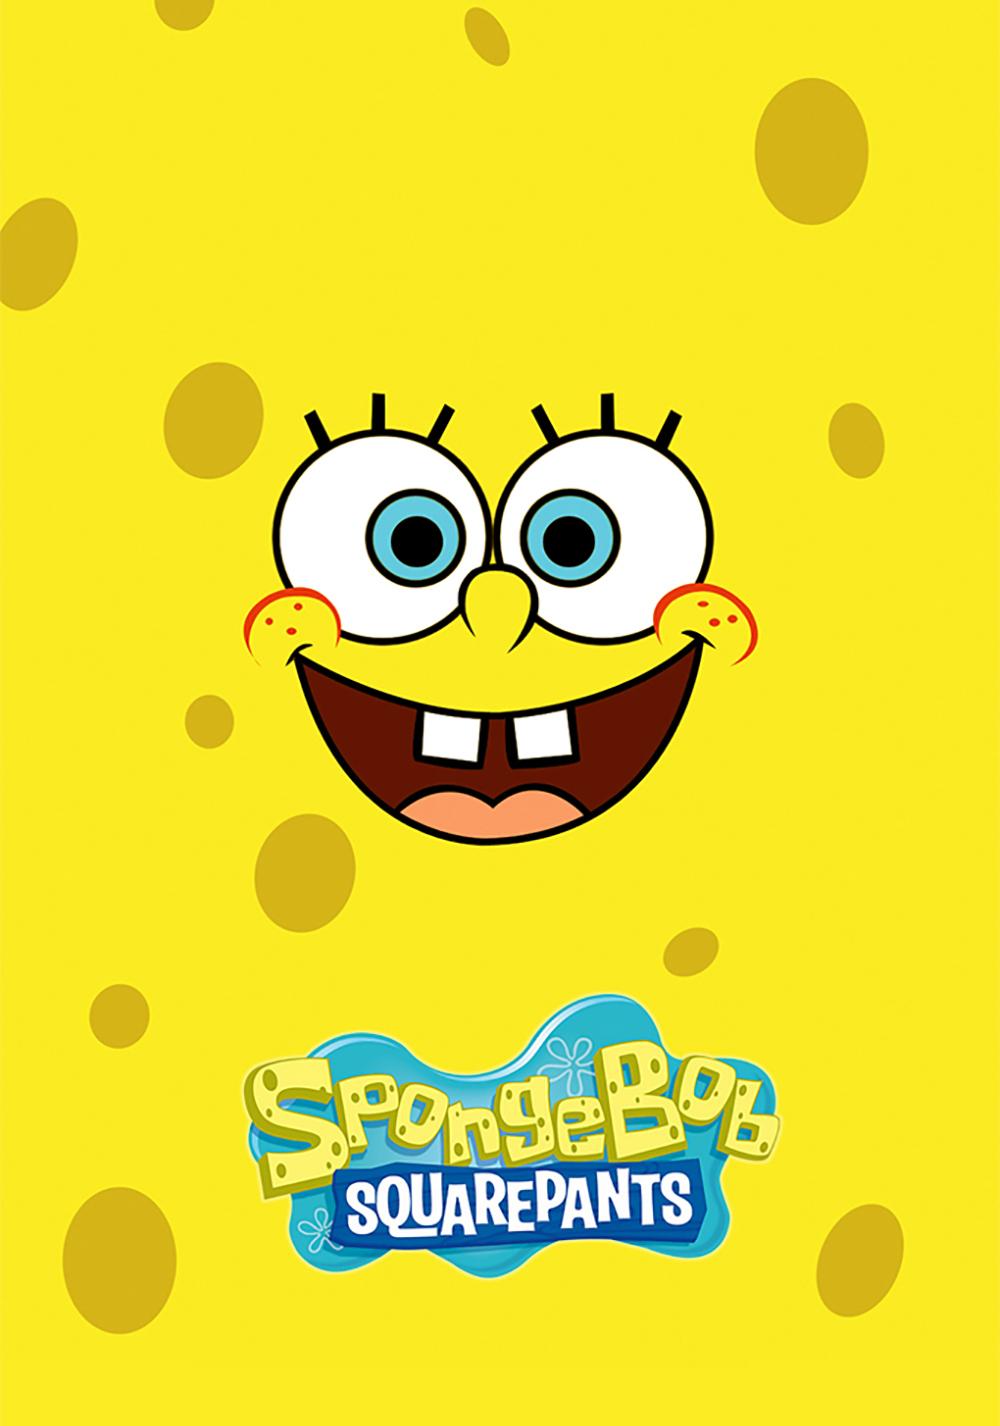 SpongeBob SquarePants | TV fanart | fanart.tv